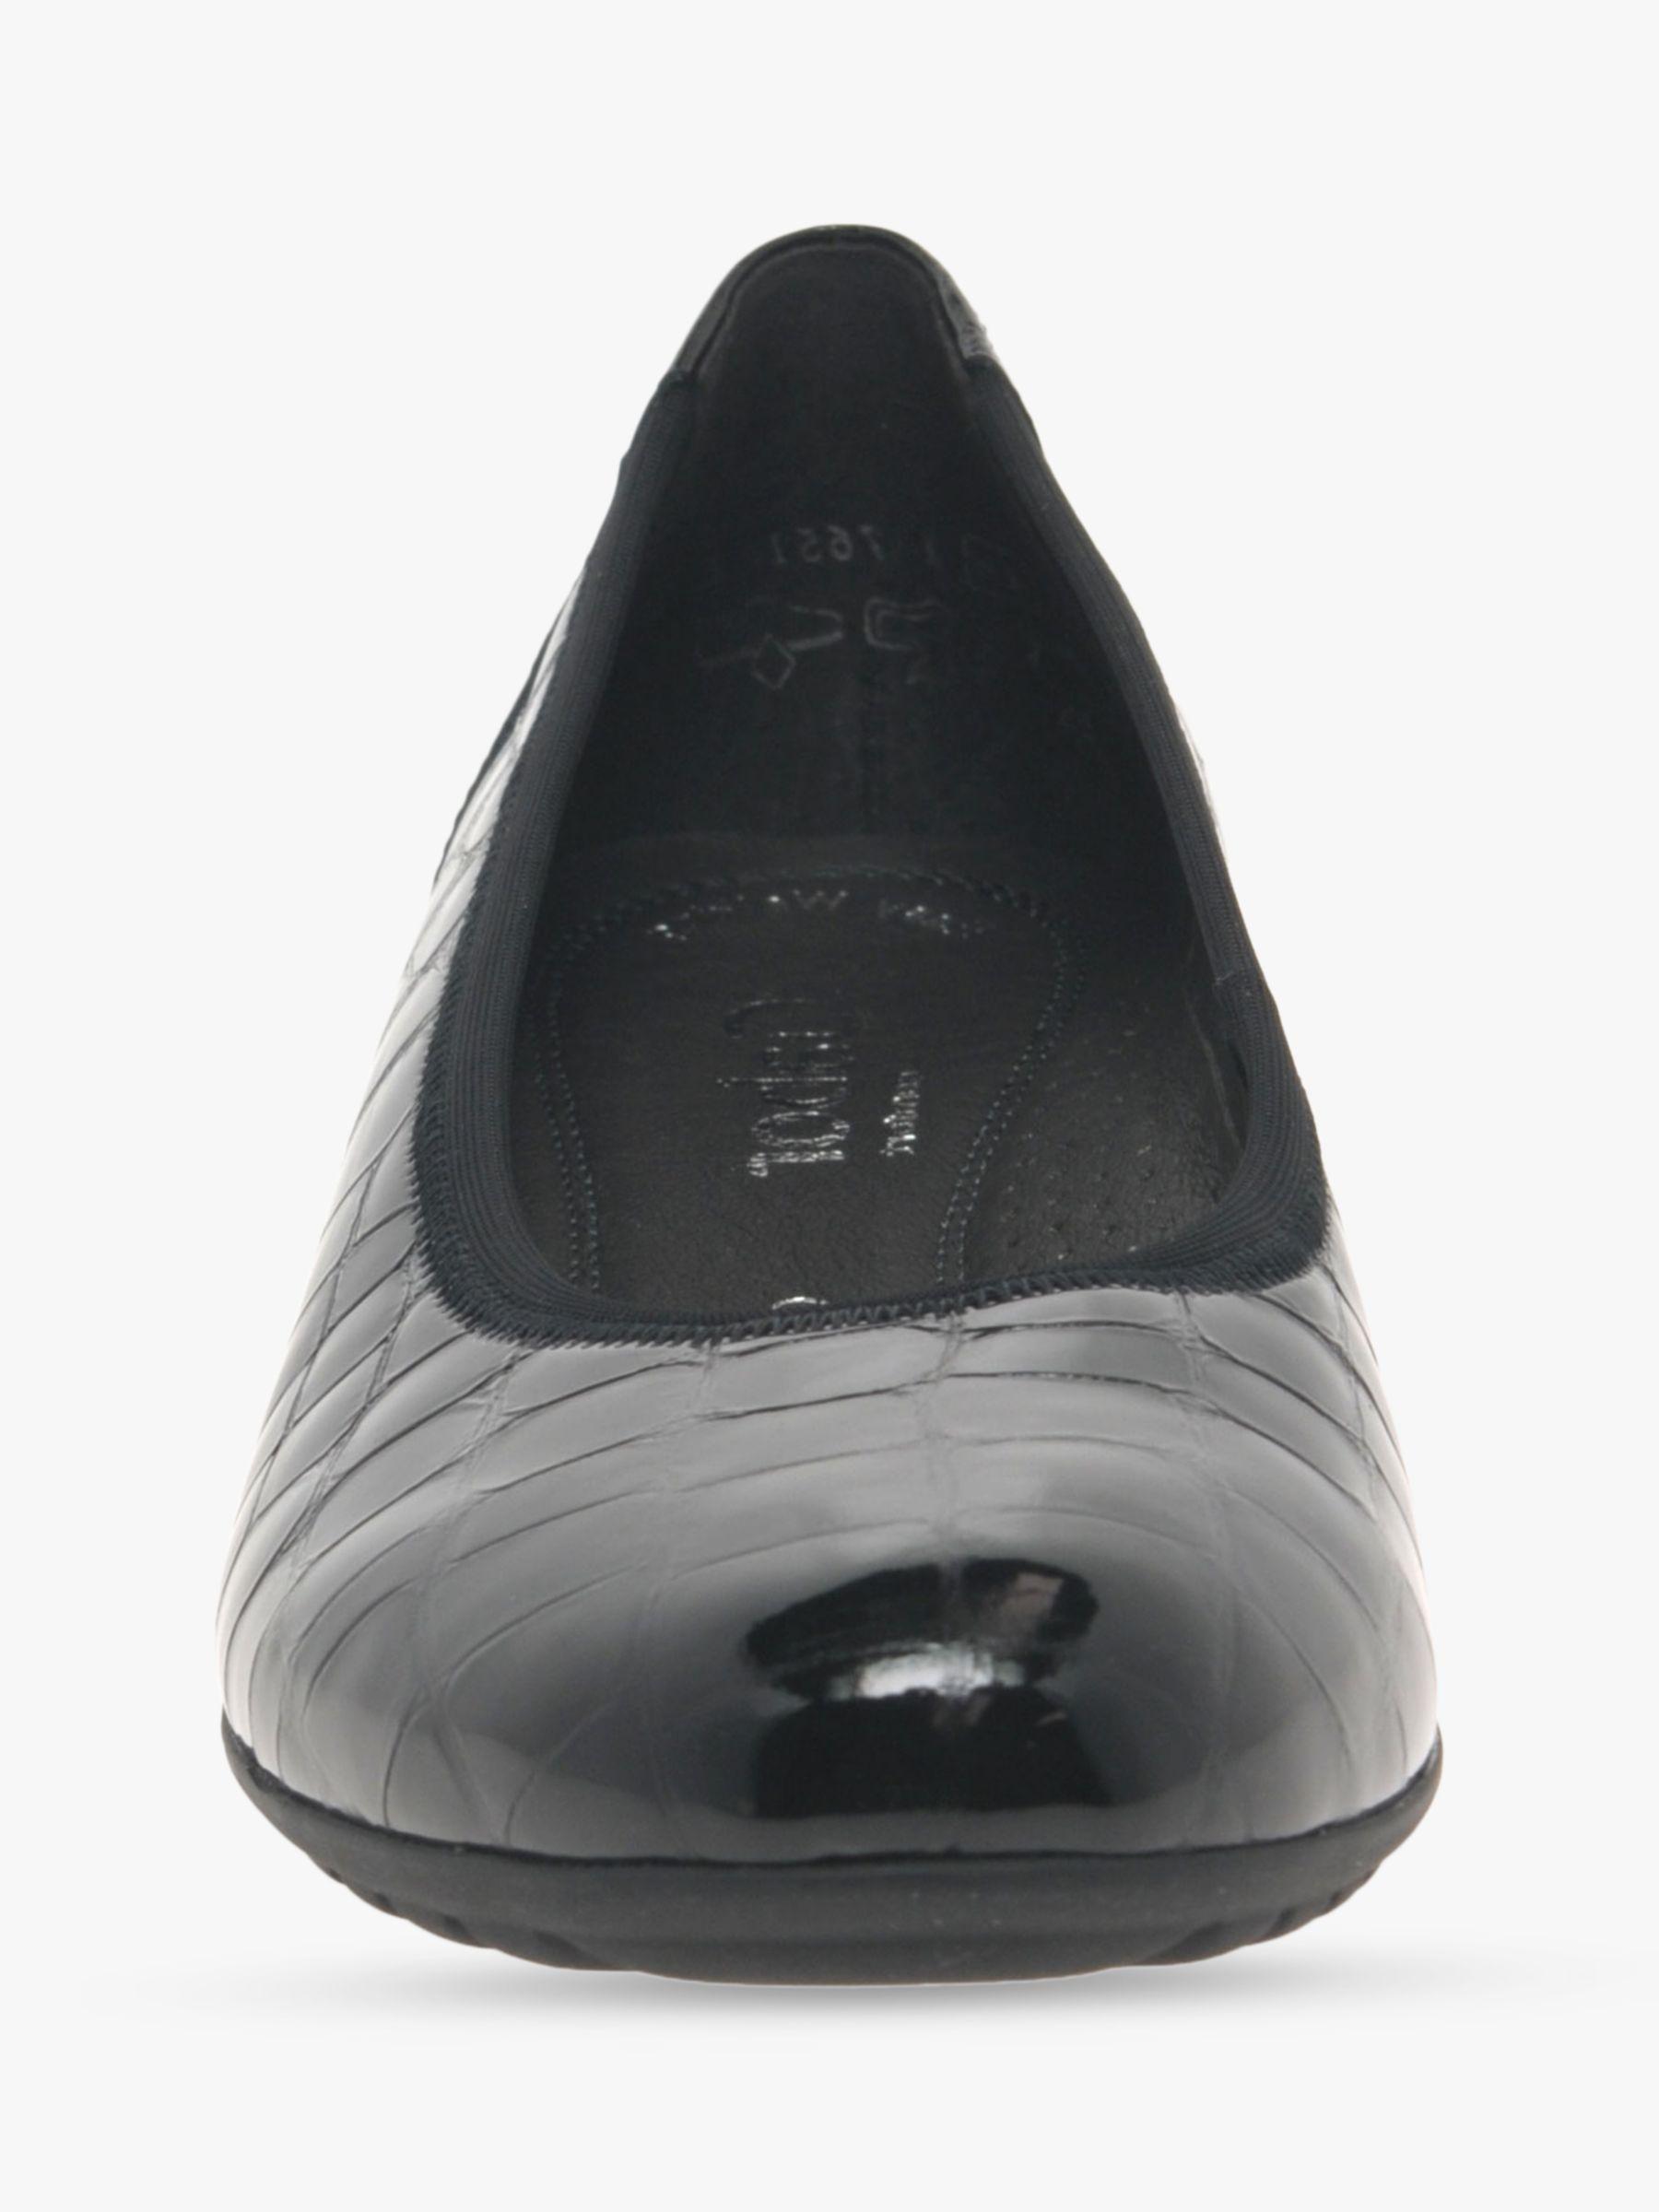 Gabor Splash Wide Fit Patent Leather